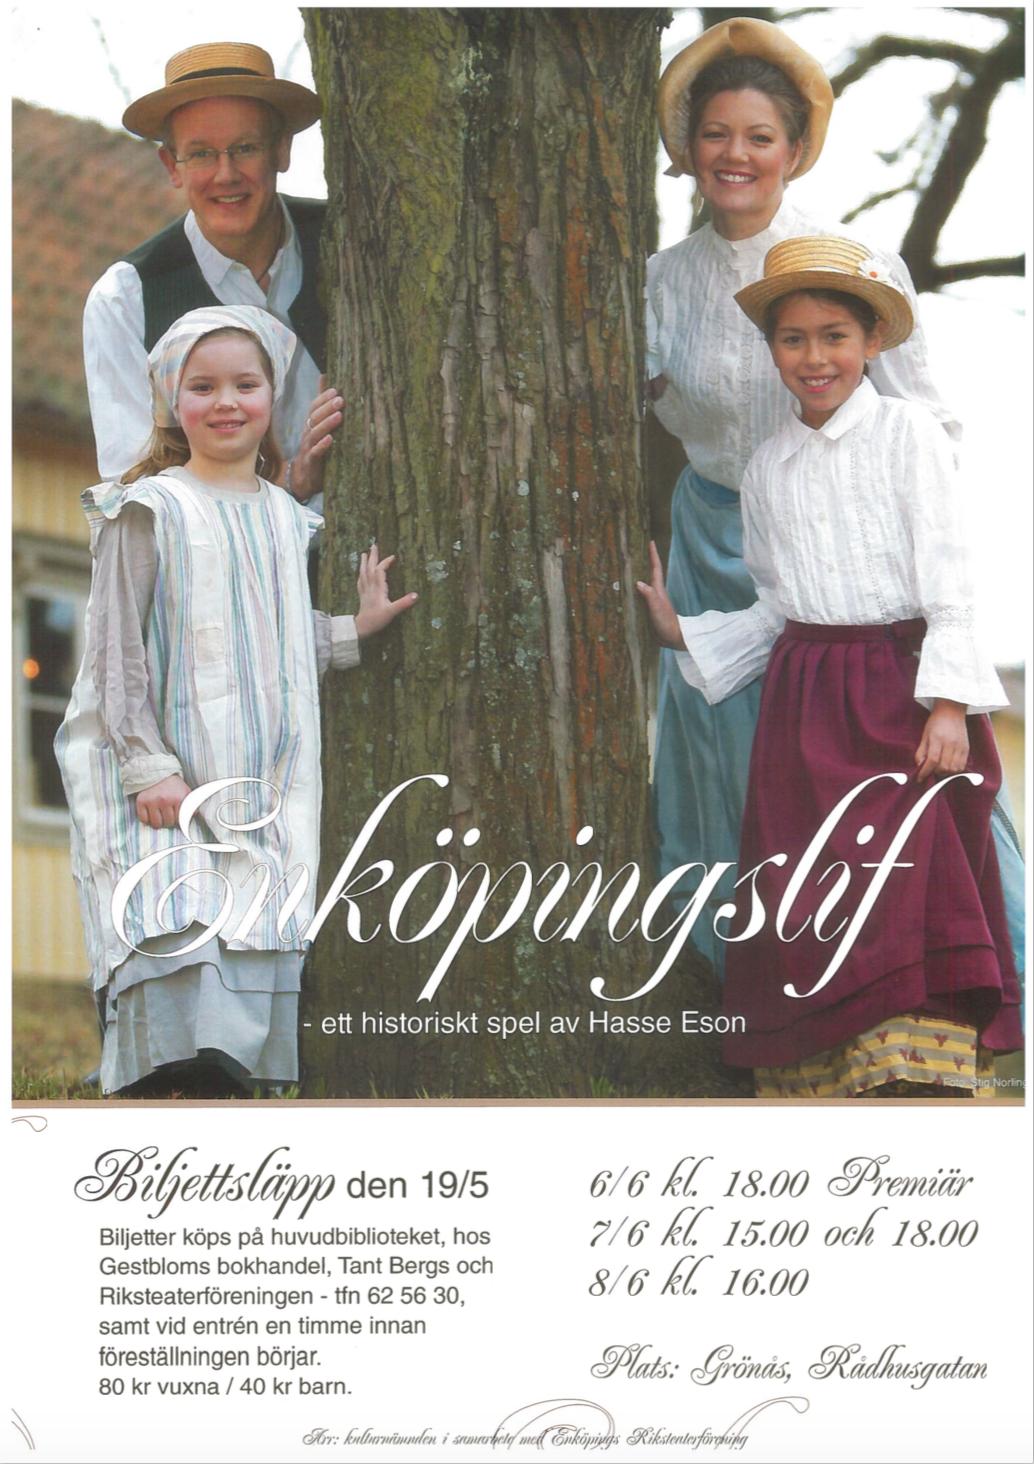 2005-affisch-enkopingslif-med-bland-andra-enkopings-kammarkor